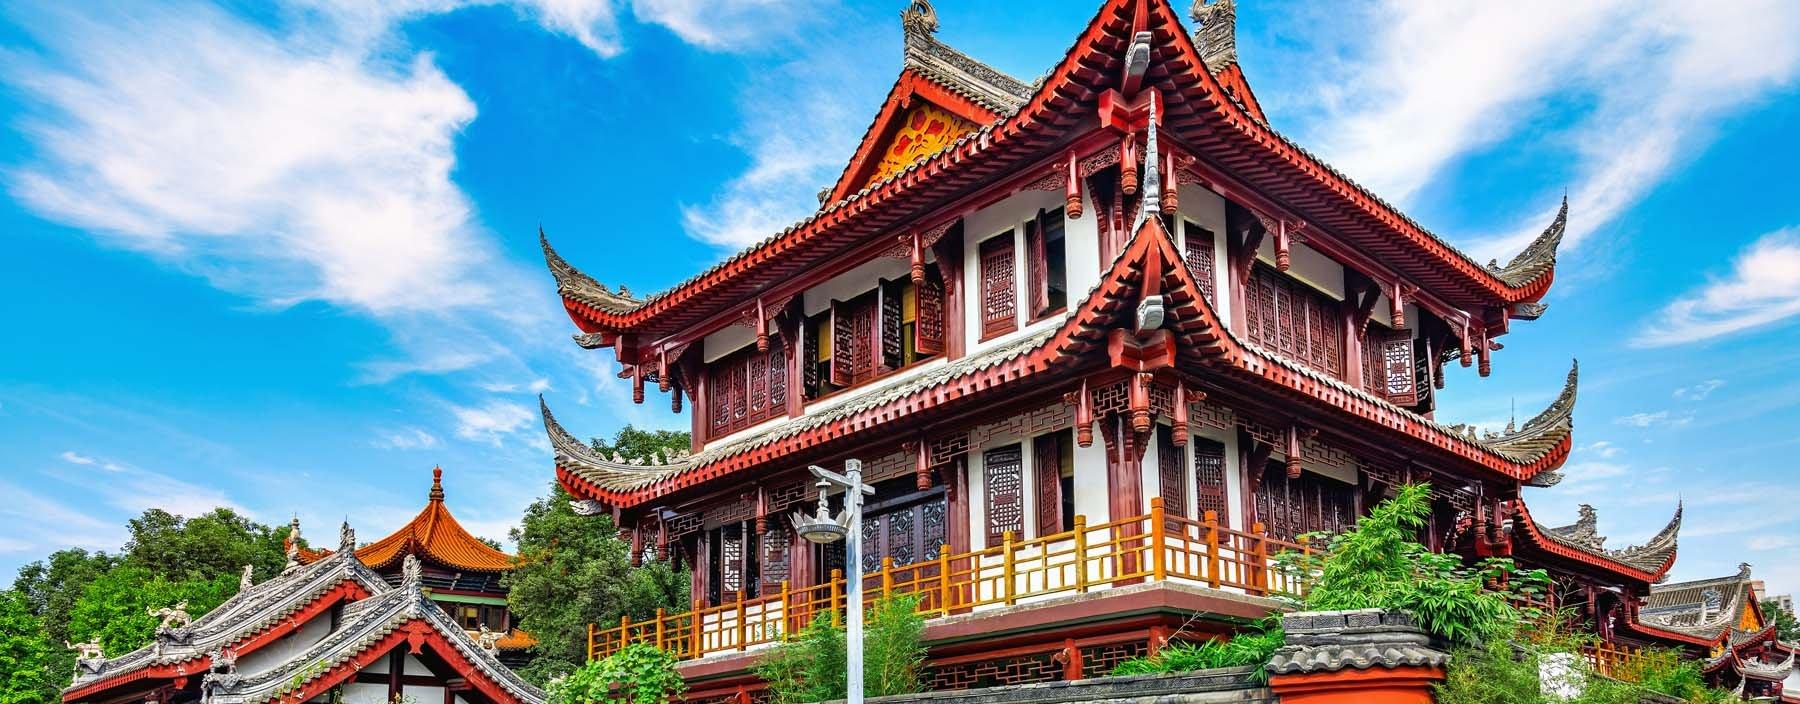 cn, chengdu, wenshu klooster (4).jpg